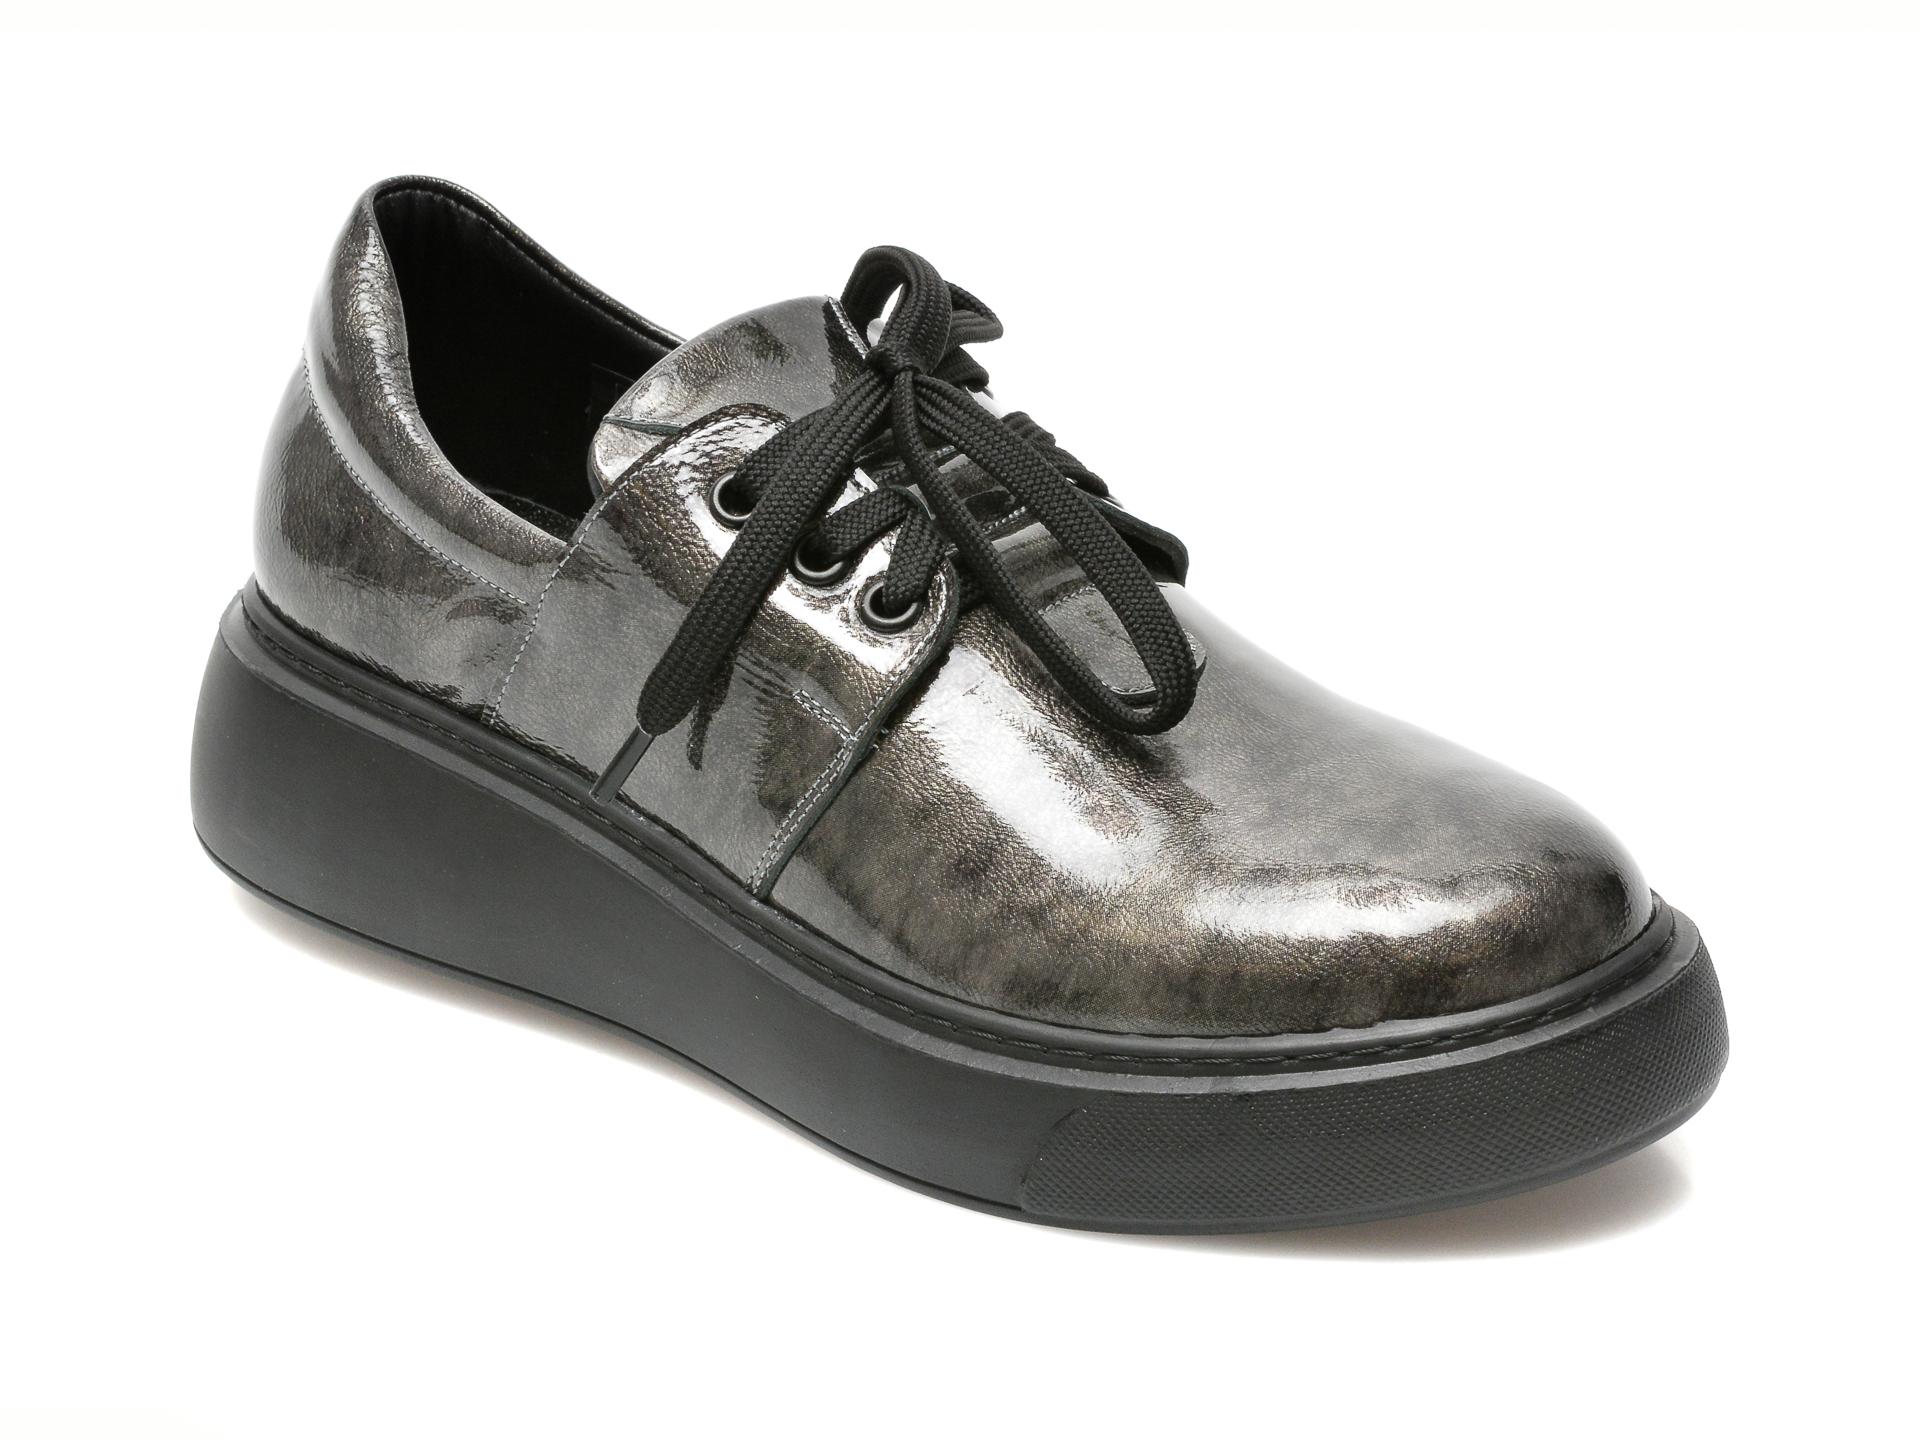 Pantofi Flavia Passini Gri, 15406, Din Piele Naturala Lacuita